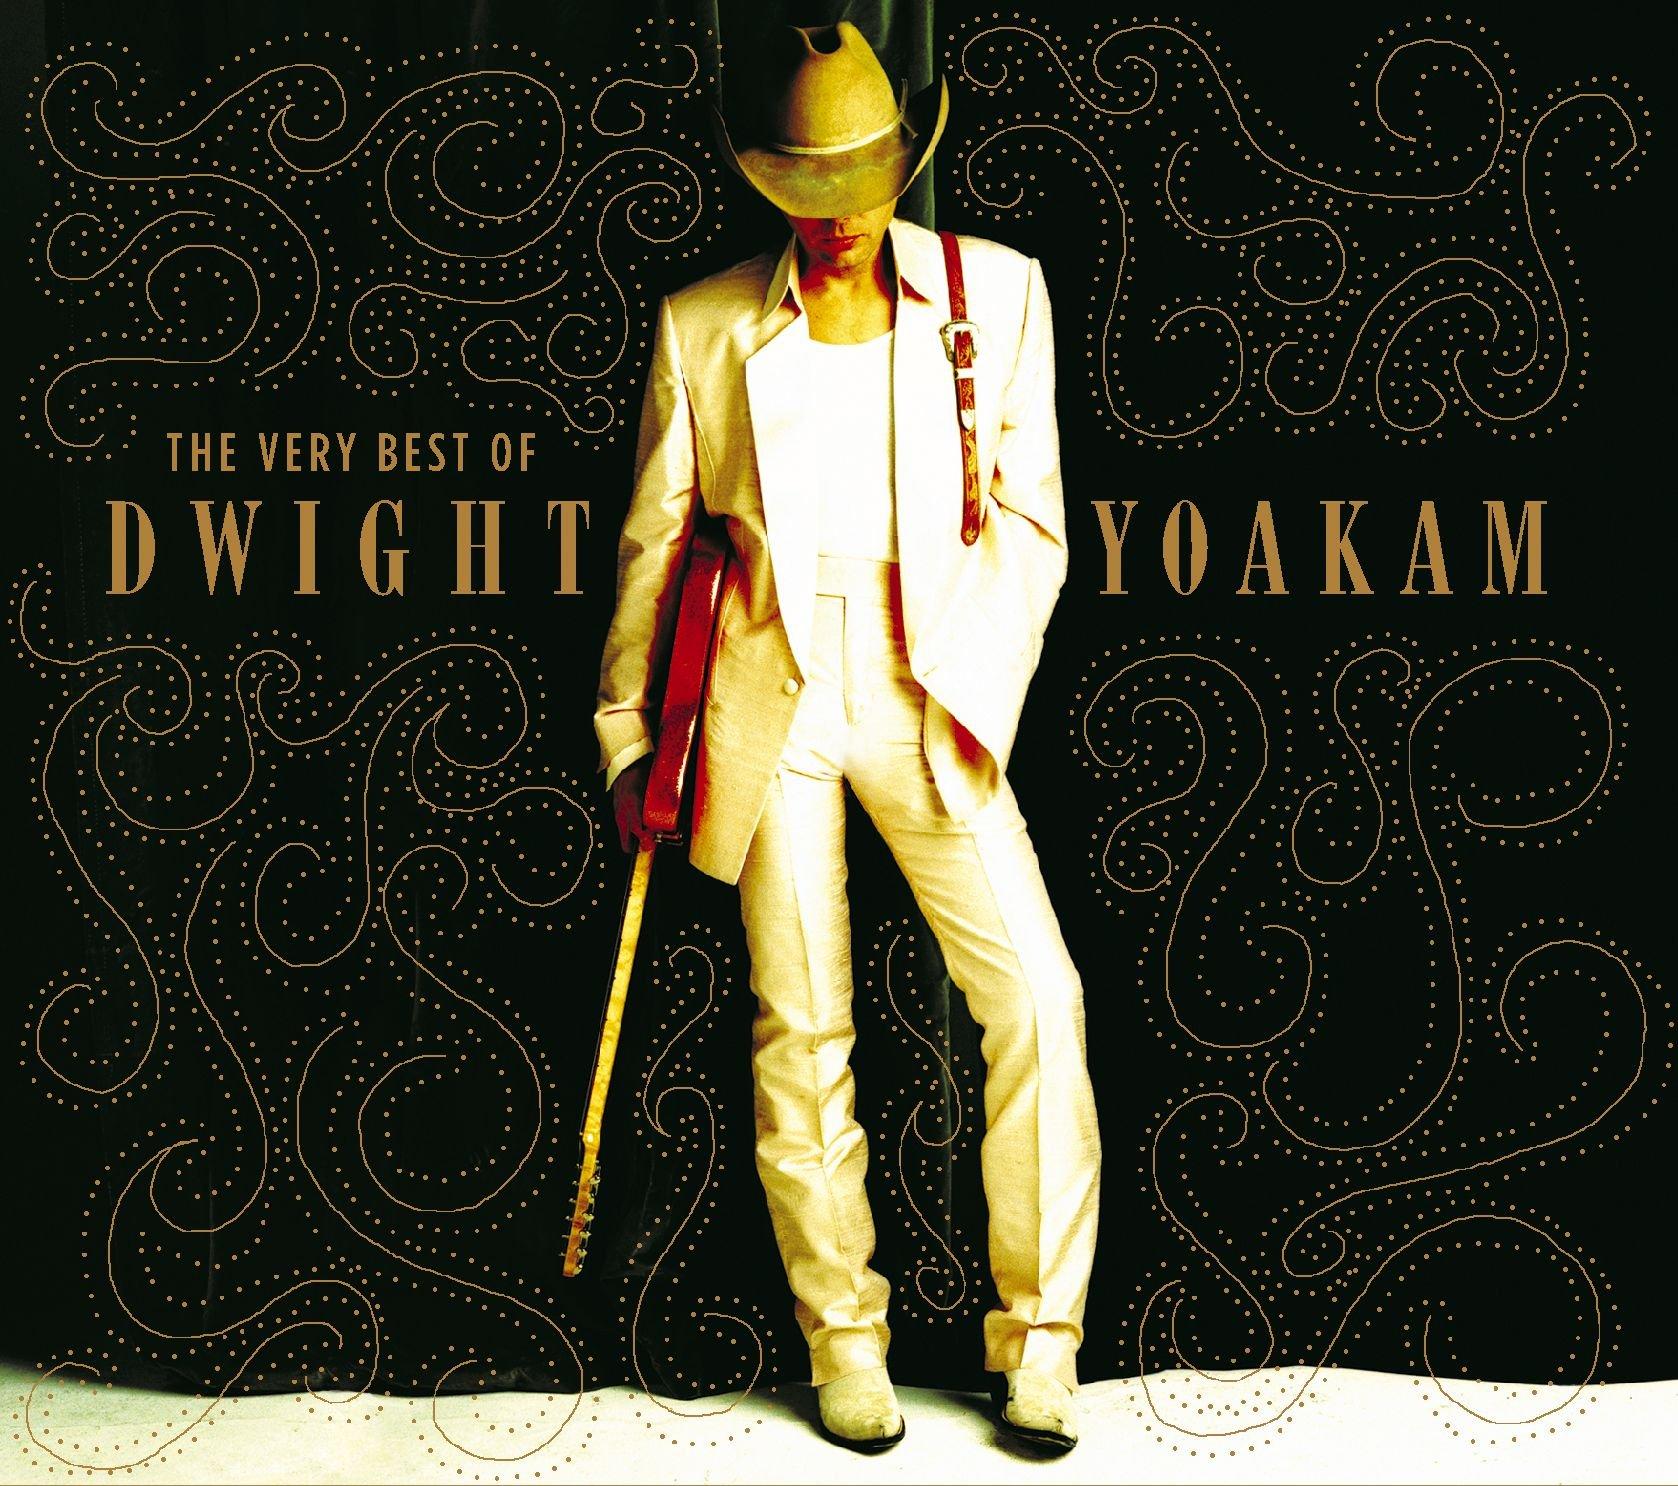 The Very Best Of Dwight Yoakam by YOAKAM,DWIGHT